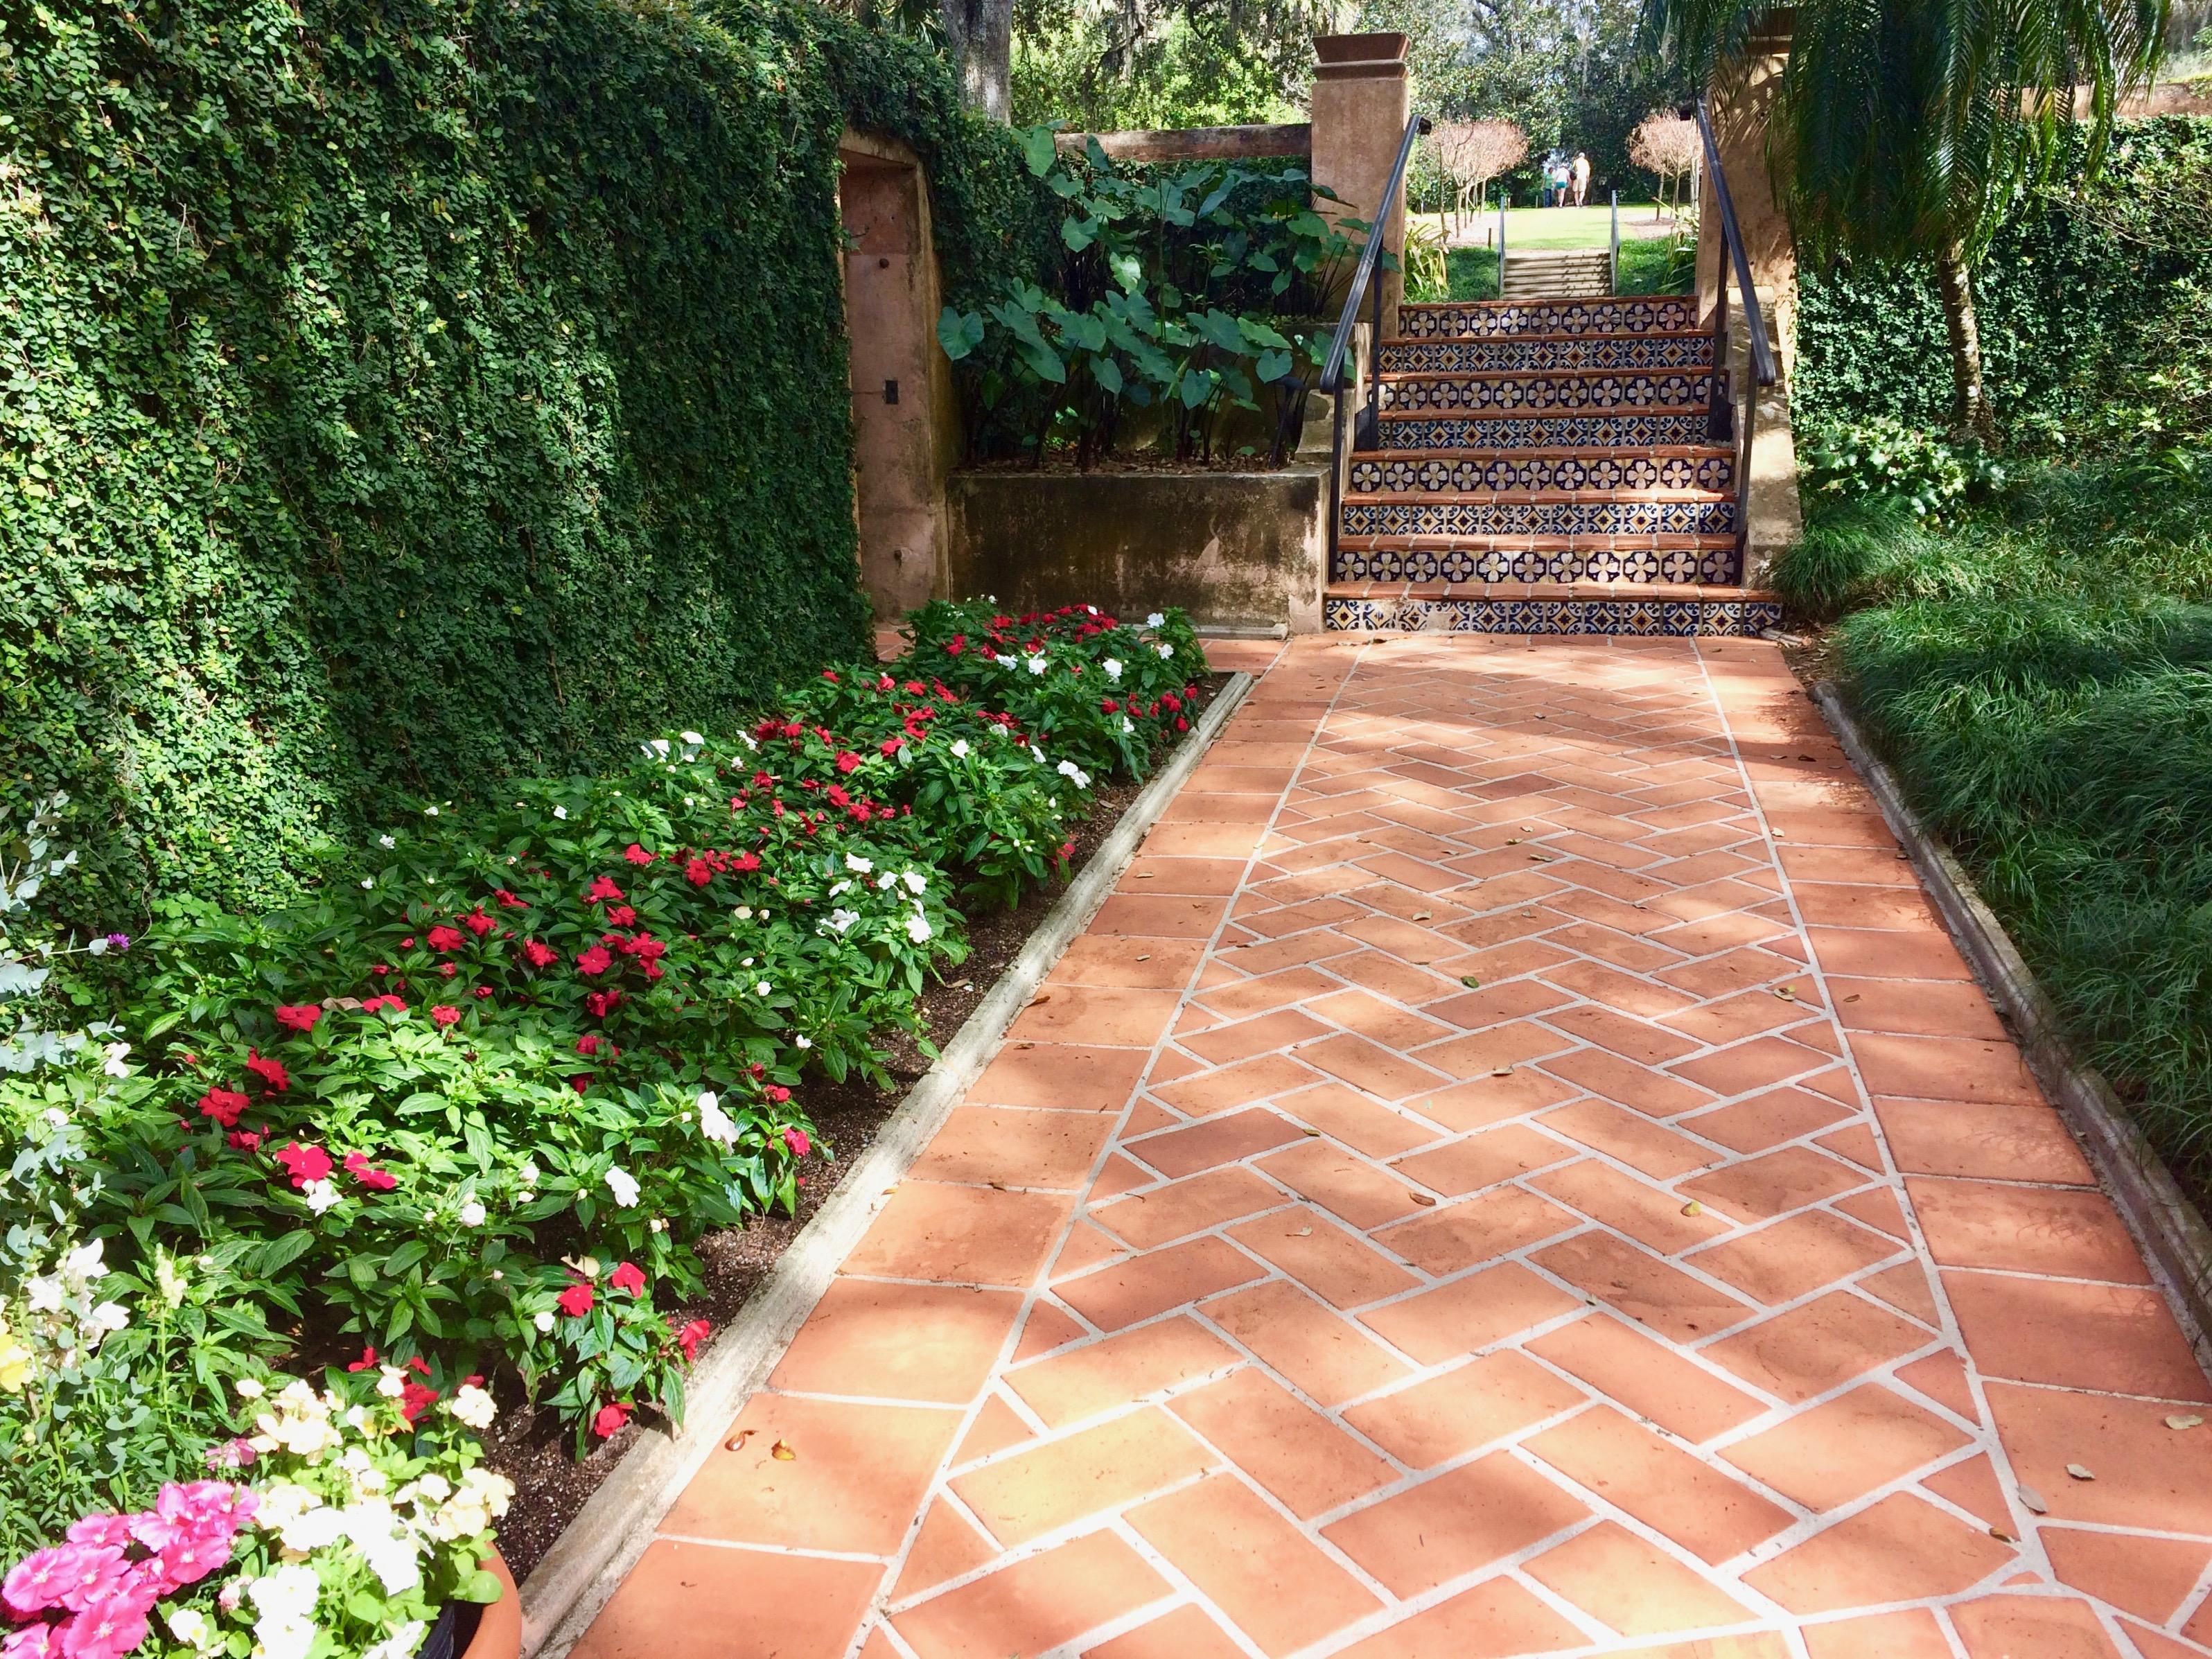 Tile outdoors PInewood Estate